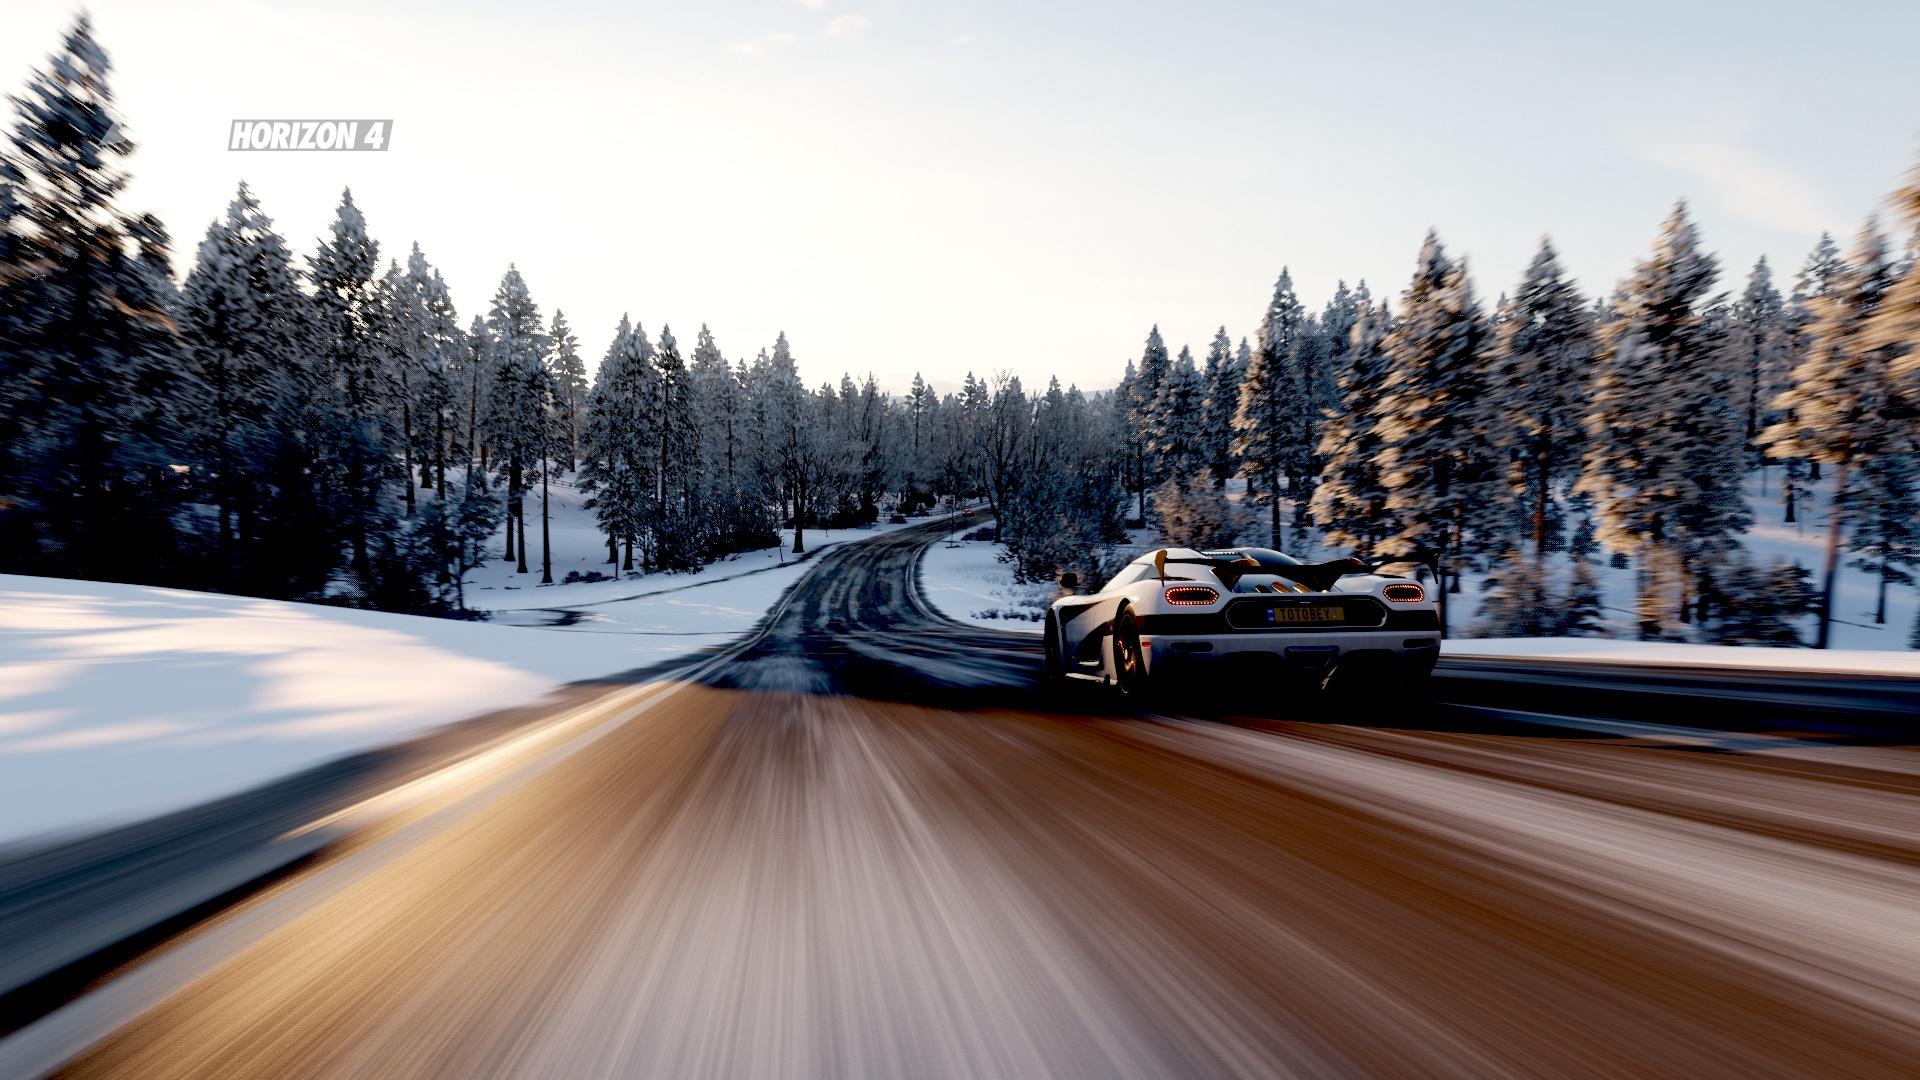 General 1920x1080 Forza Horizon 4 landscape Video Game Landscape car Koenigsegg Koenigsegg Agera RS snow white